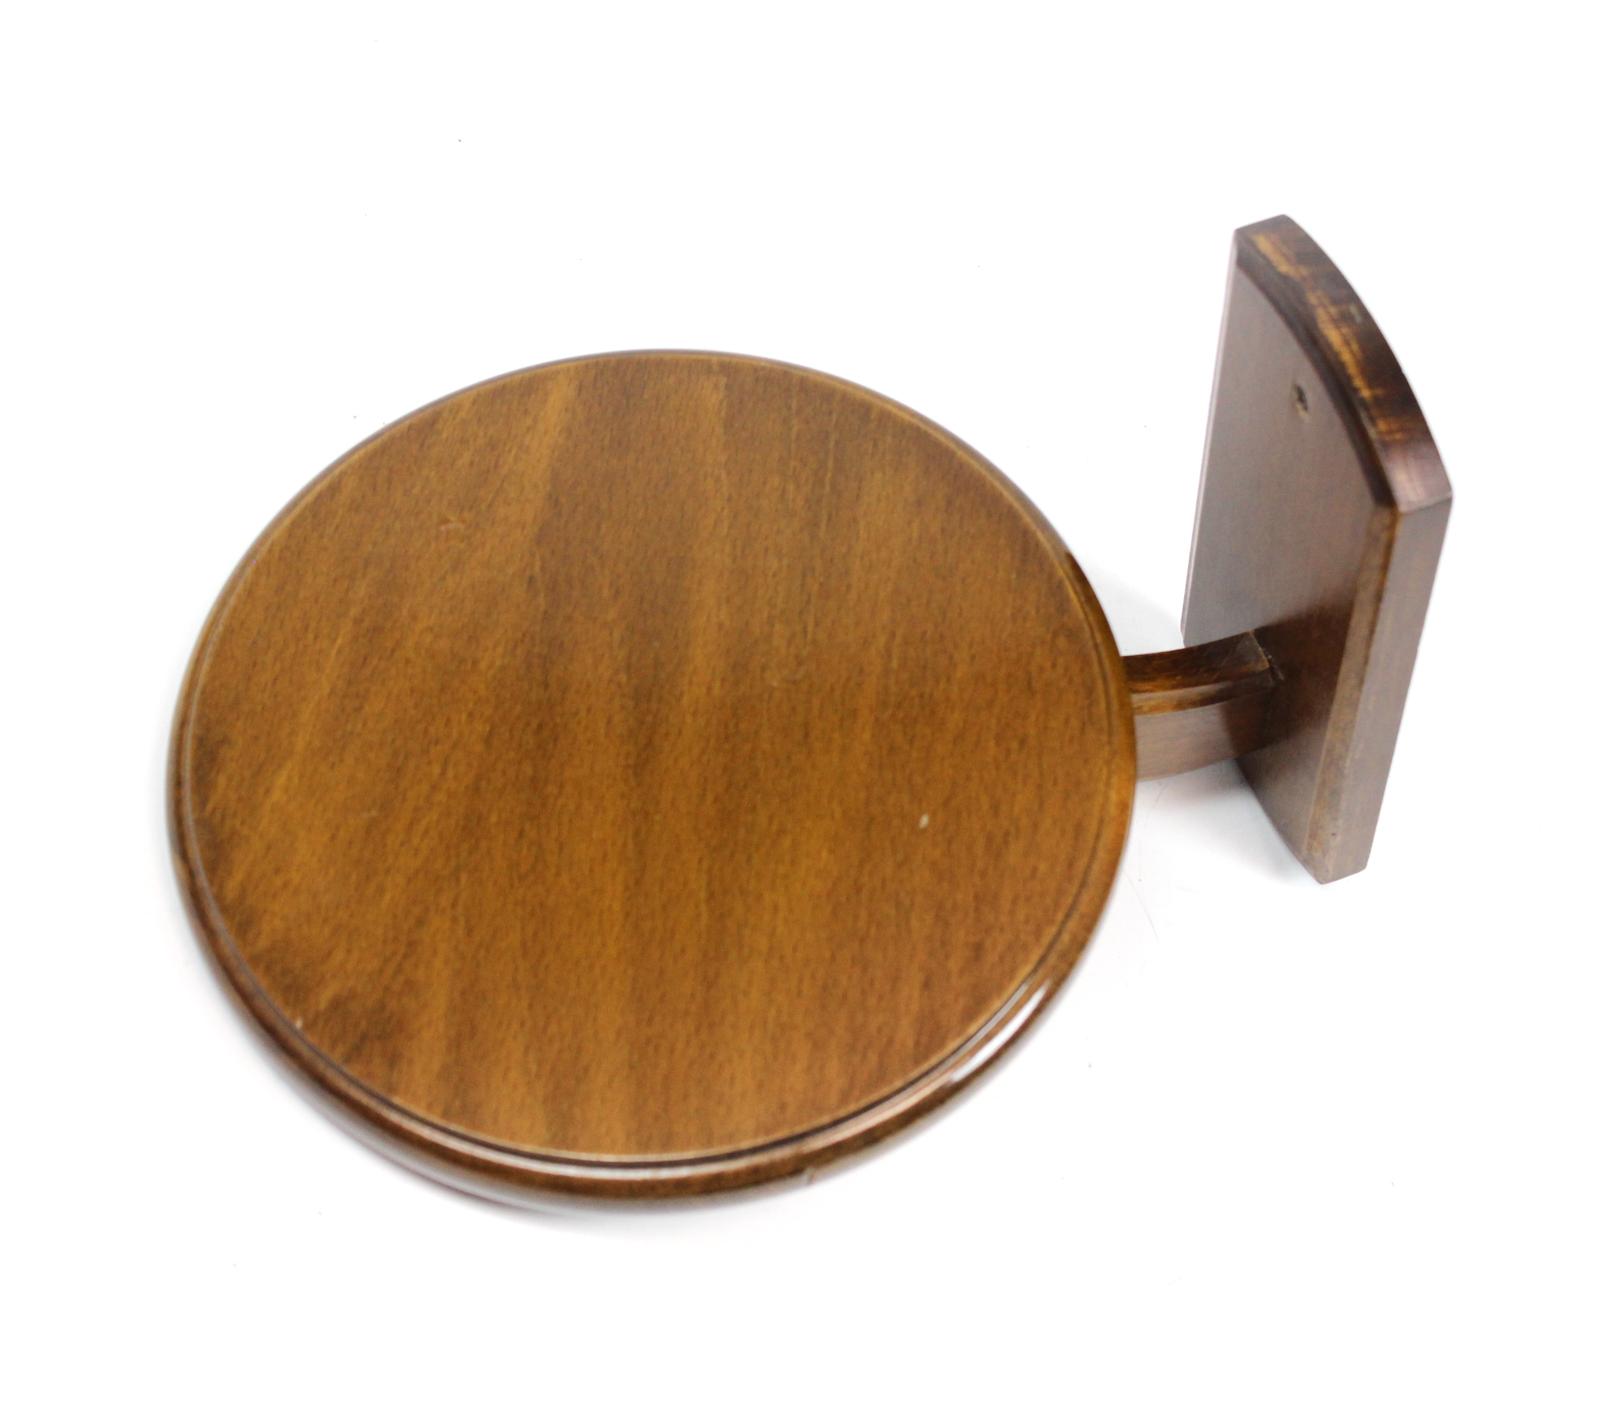 kleines wandregal nussbaum holz wand halter 21 cm dunkel braun plateau blage ebay. Black Bedroom Furniture Sets. Home Design Ideas